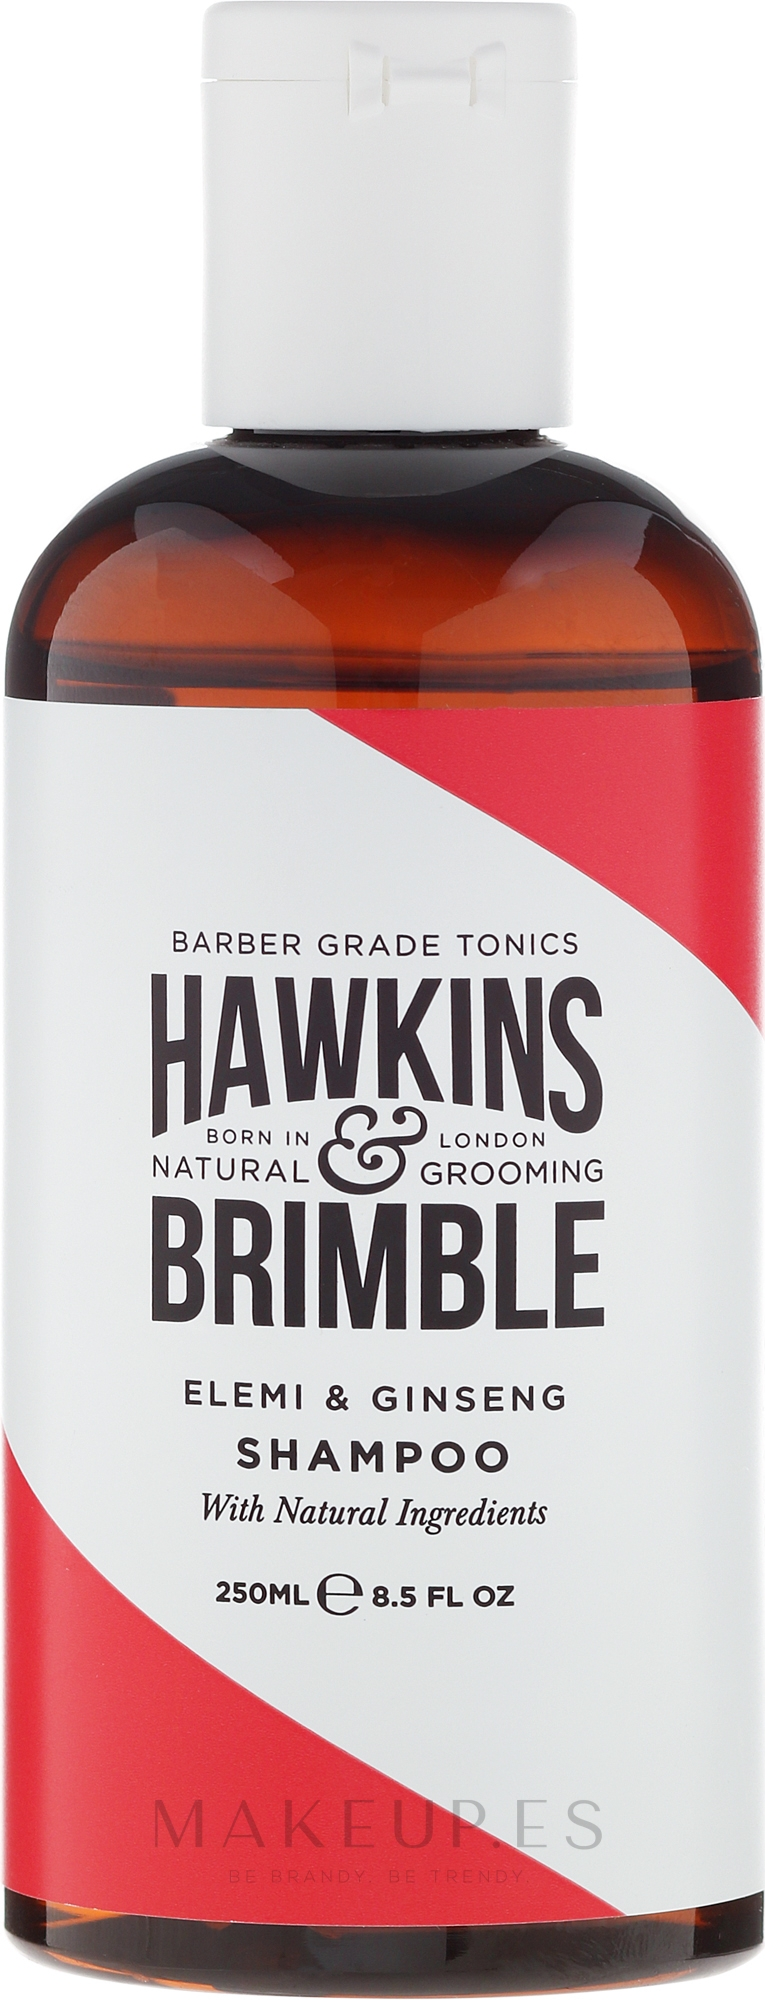 Champú con extracto de jengibre, aroma a elemi y ginseng - Hawkins & Brimble Elemi & Ginseng Shampoo — imagen 250 ml